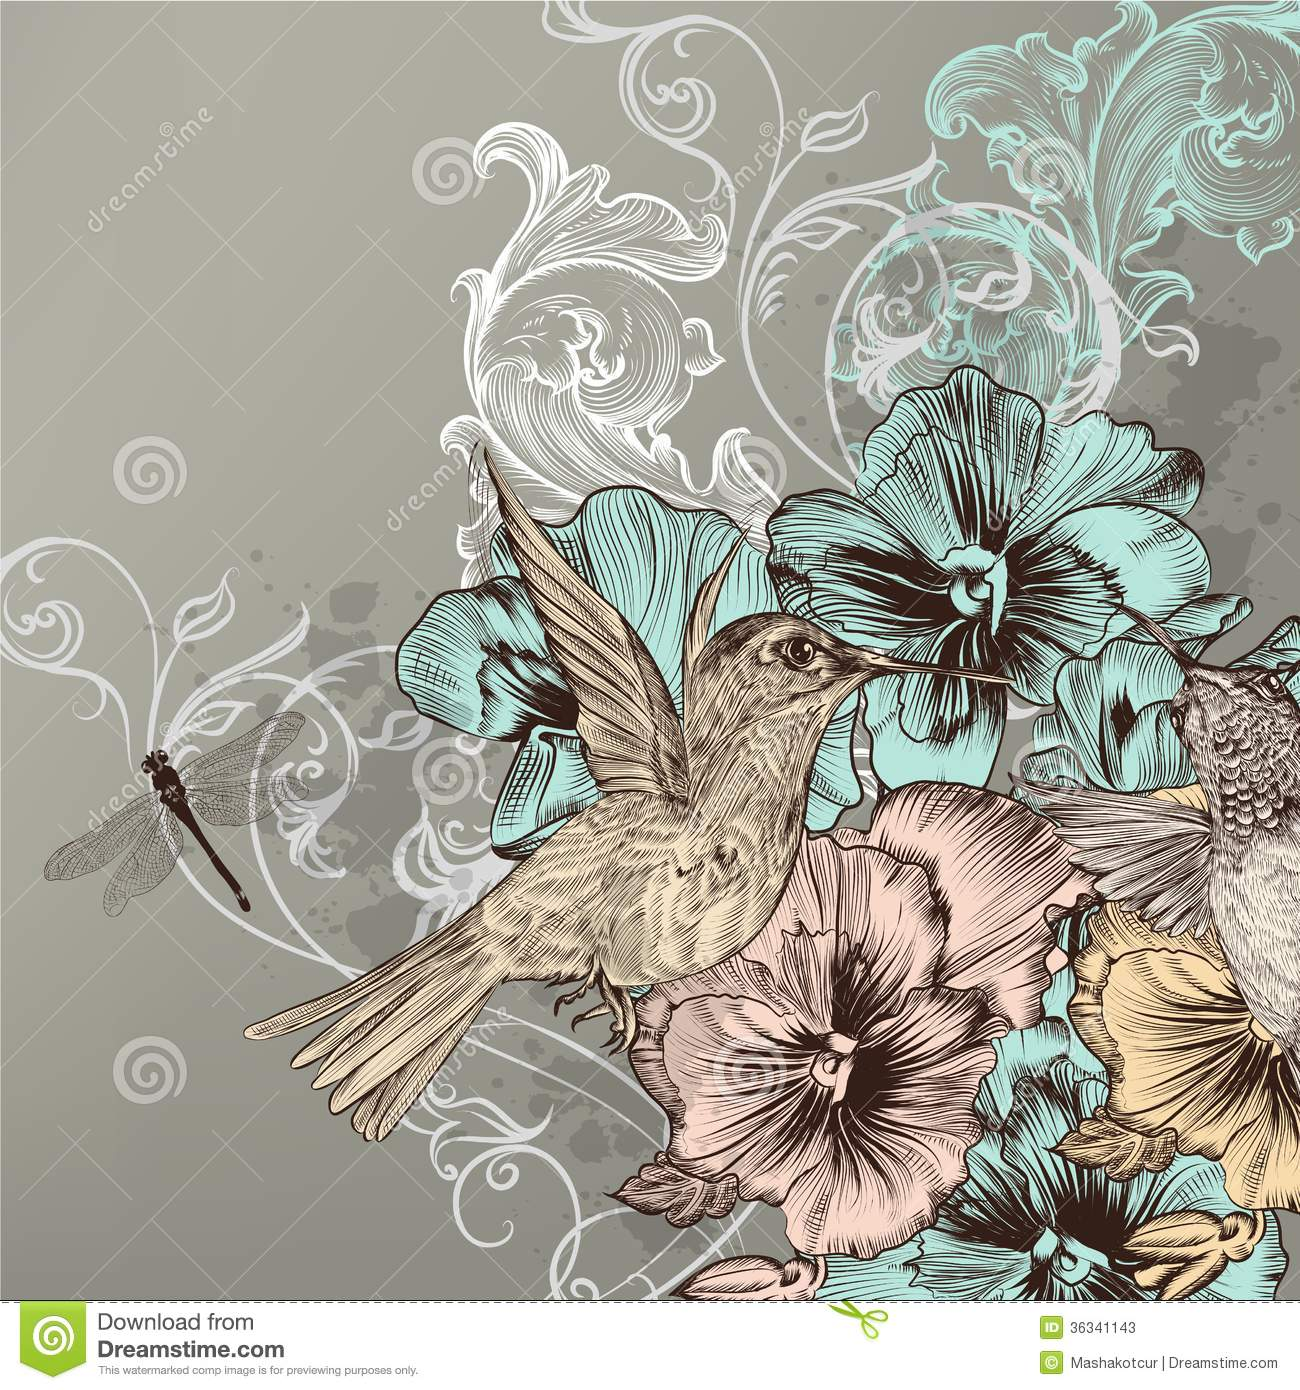 Drawn vintage flower cute Floral cute birds  floral